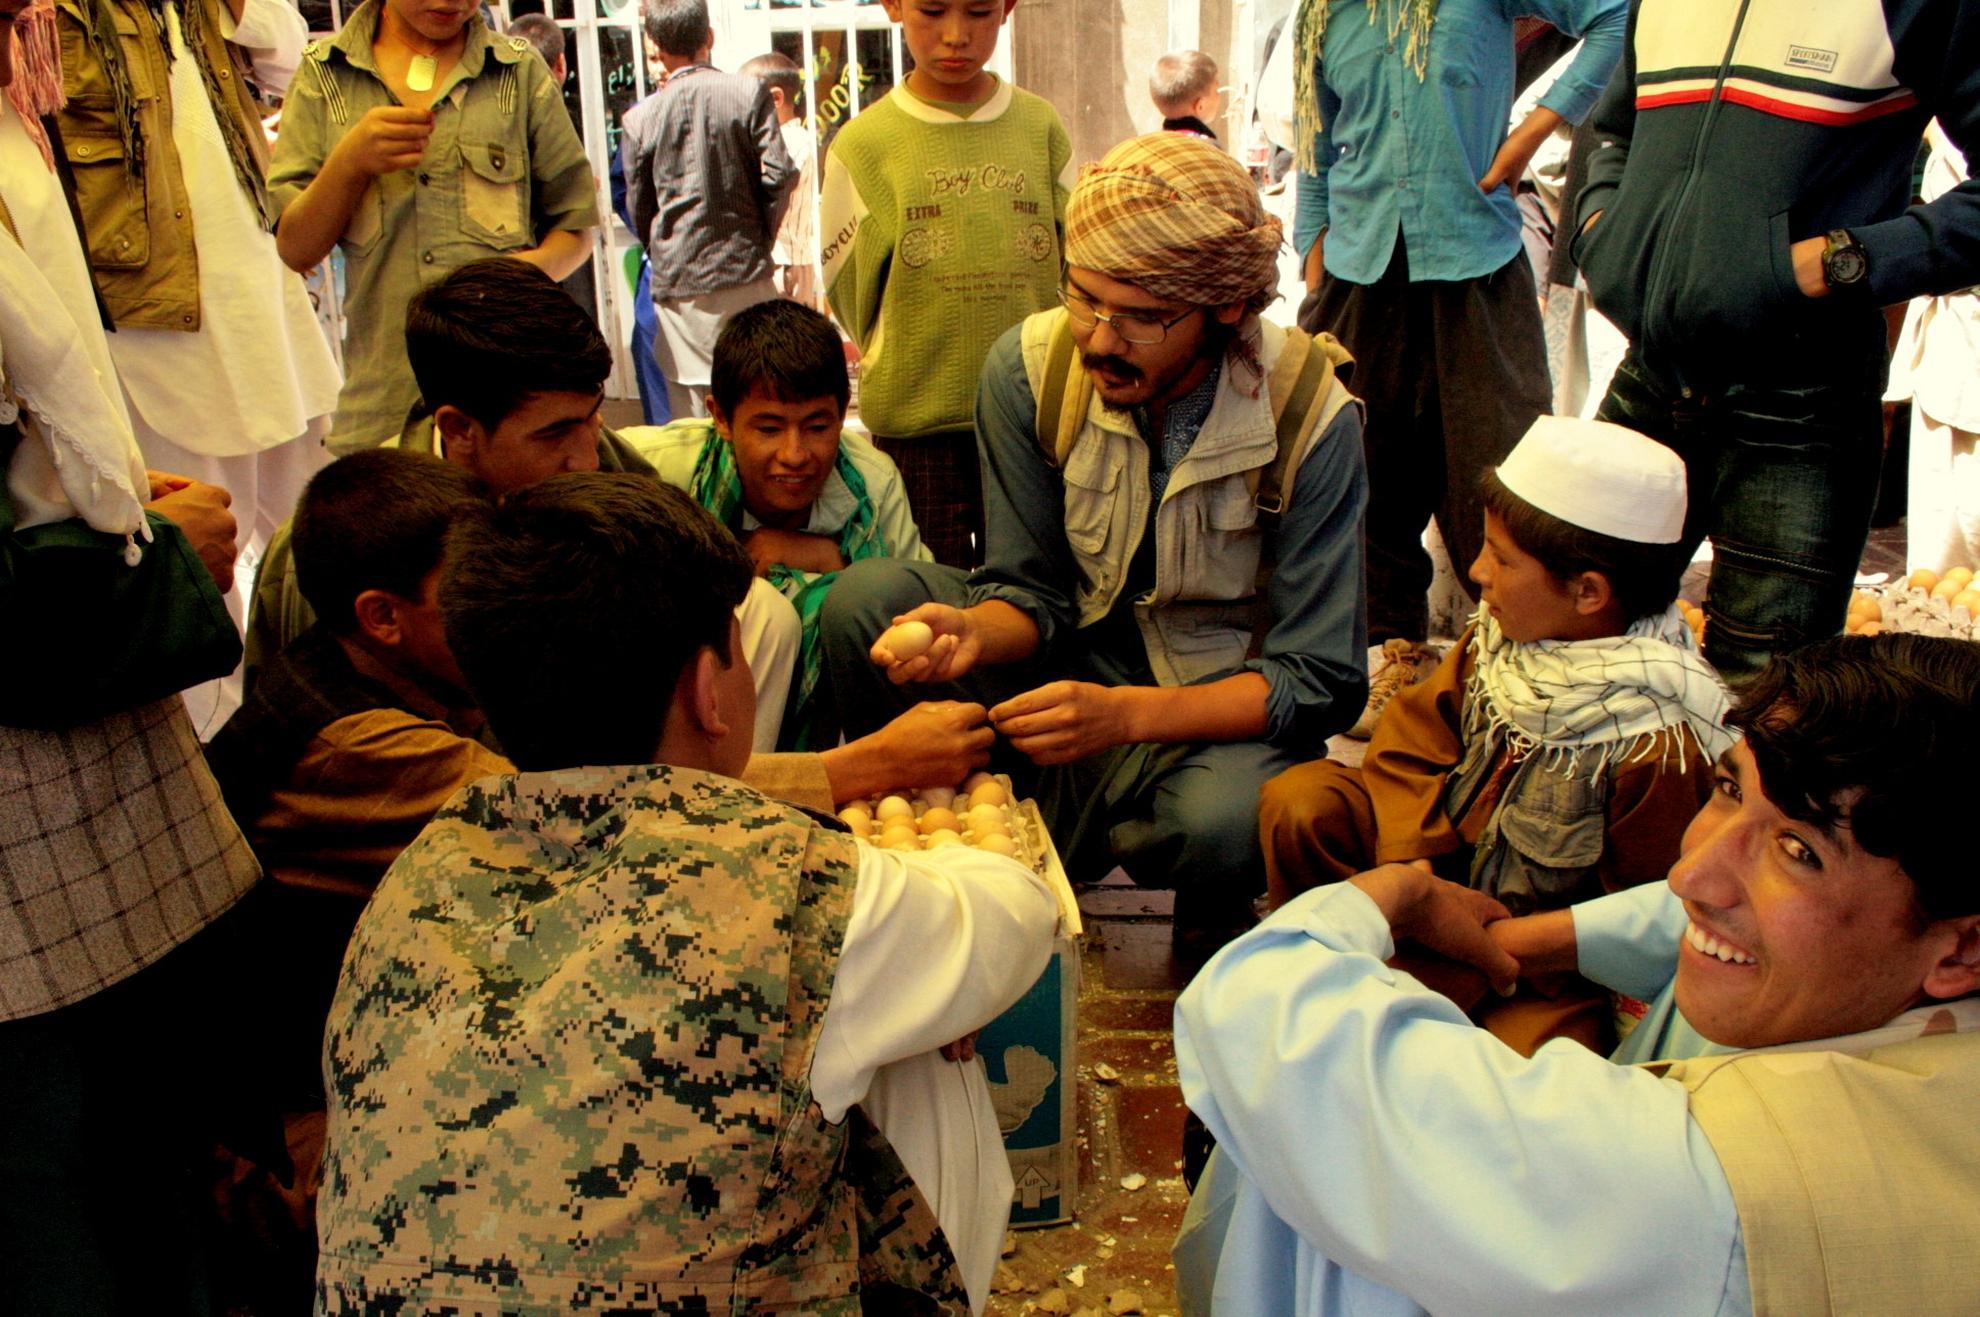 Den drabelige kamp om æg er i gang. Foto: Tahir Bakhtiary 2013